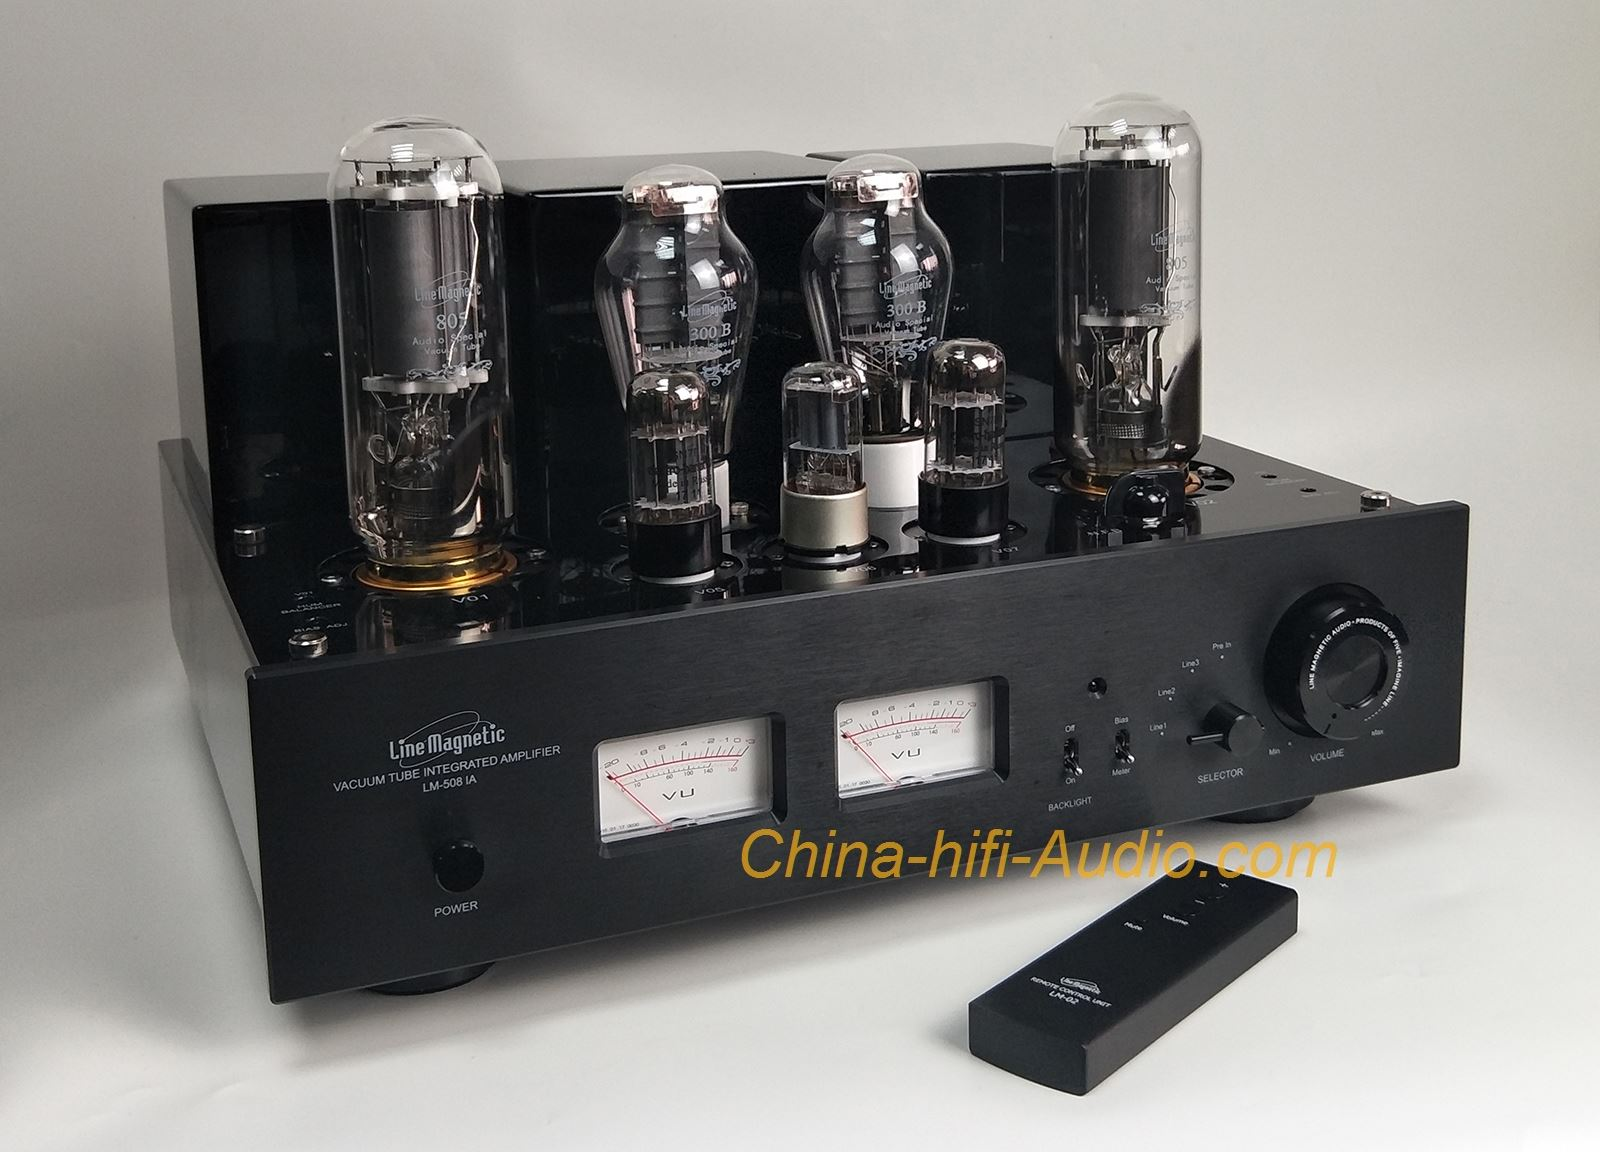 Line Magnetic Lm 508ia 300b 805 Tube Amp Class A Single